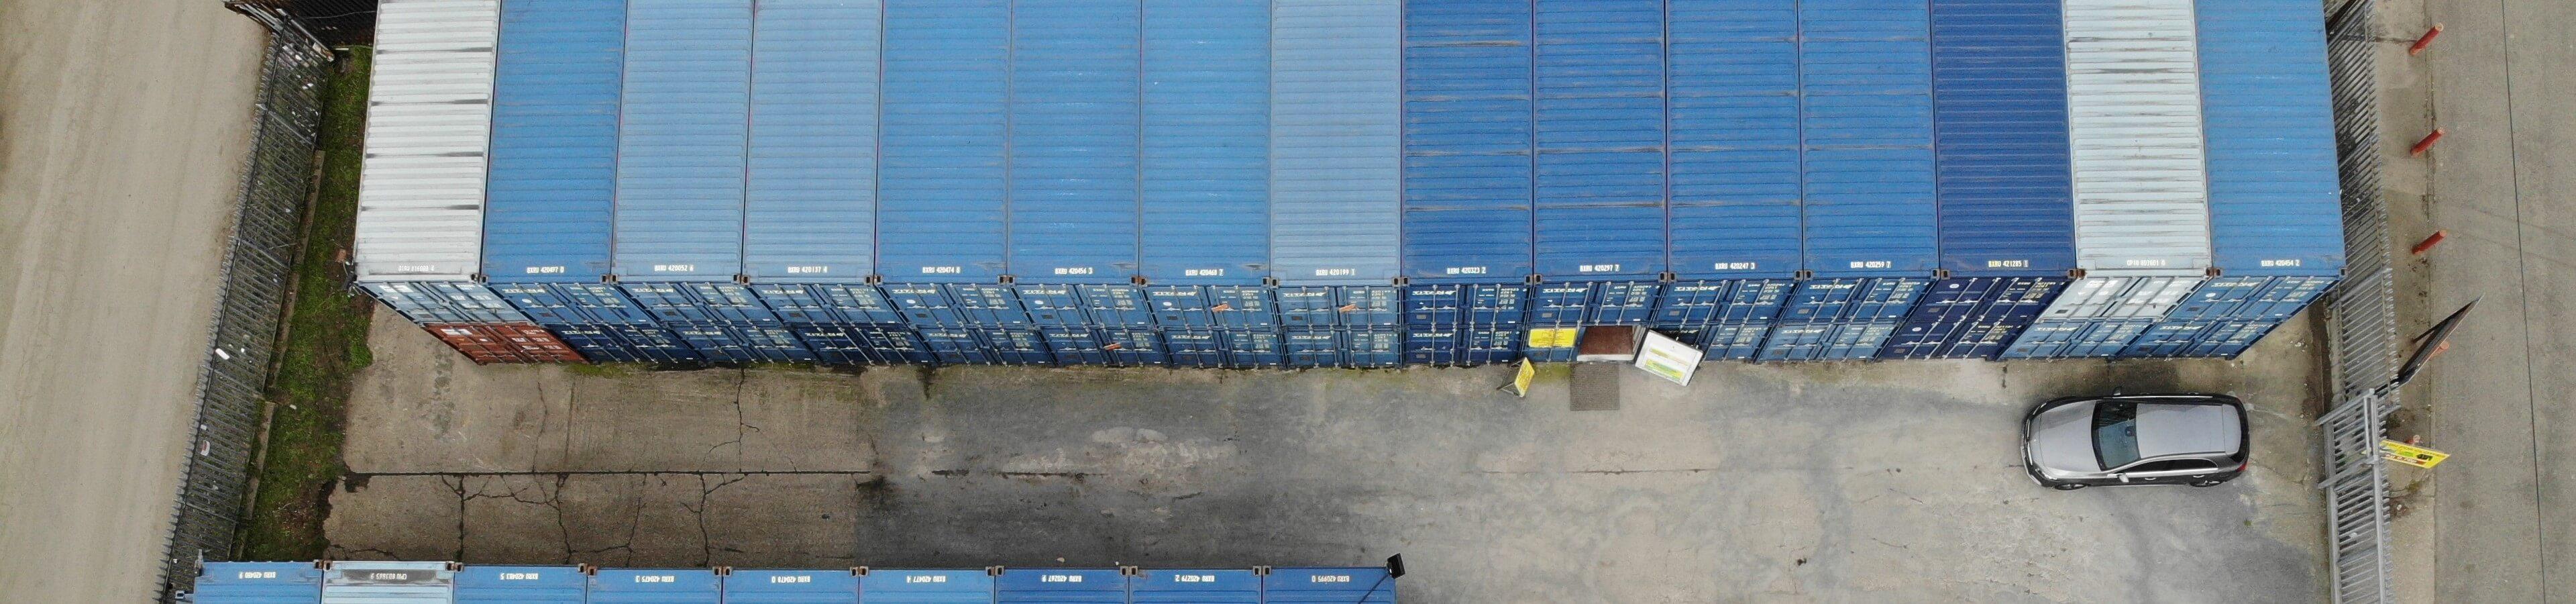 Grays Essex Self Storage header image | TITAN Containers